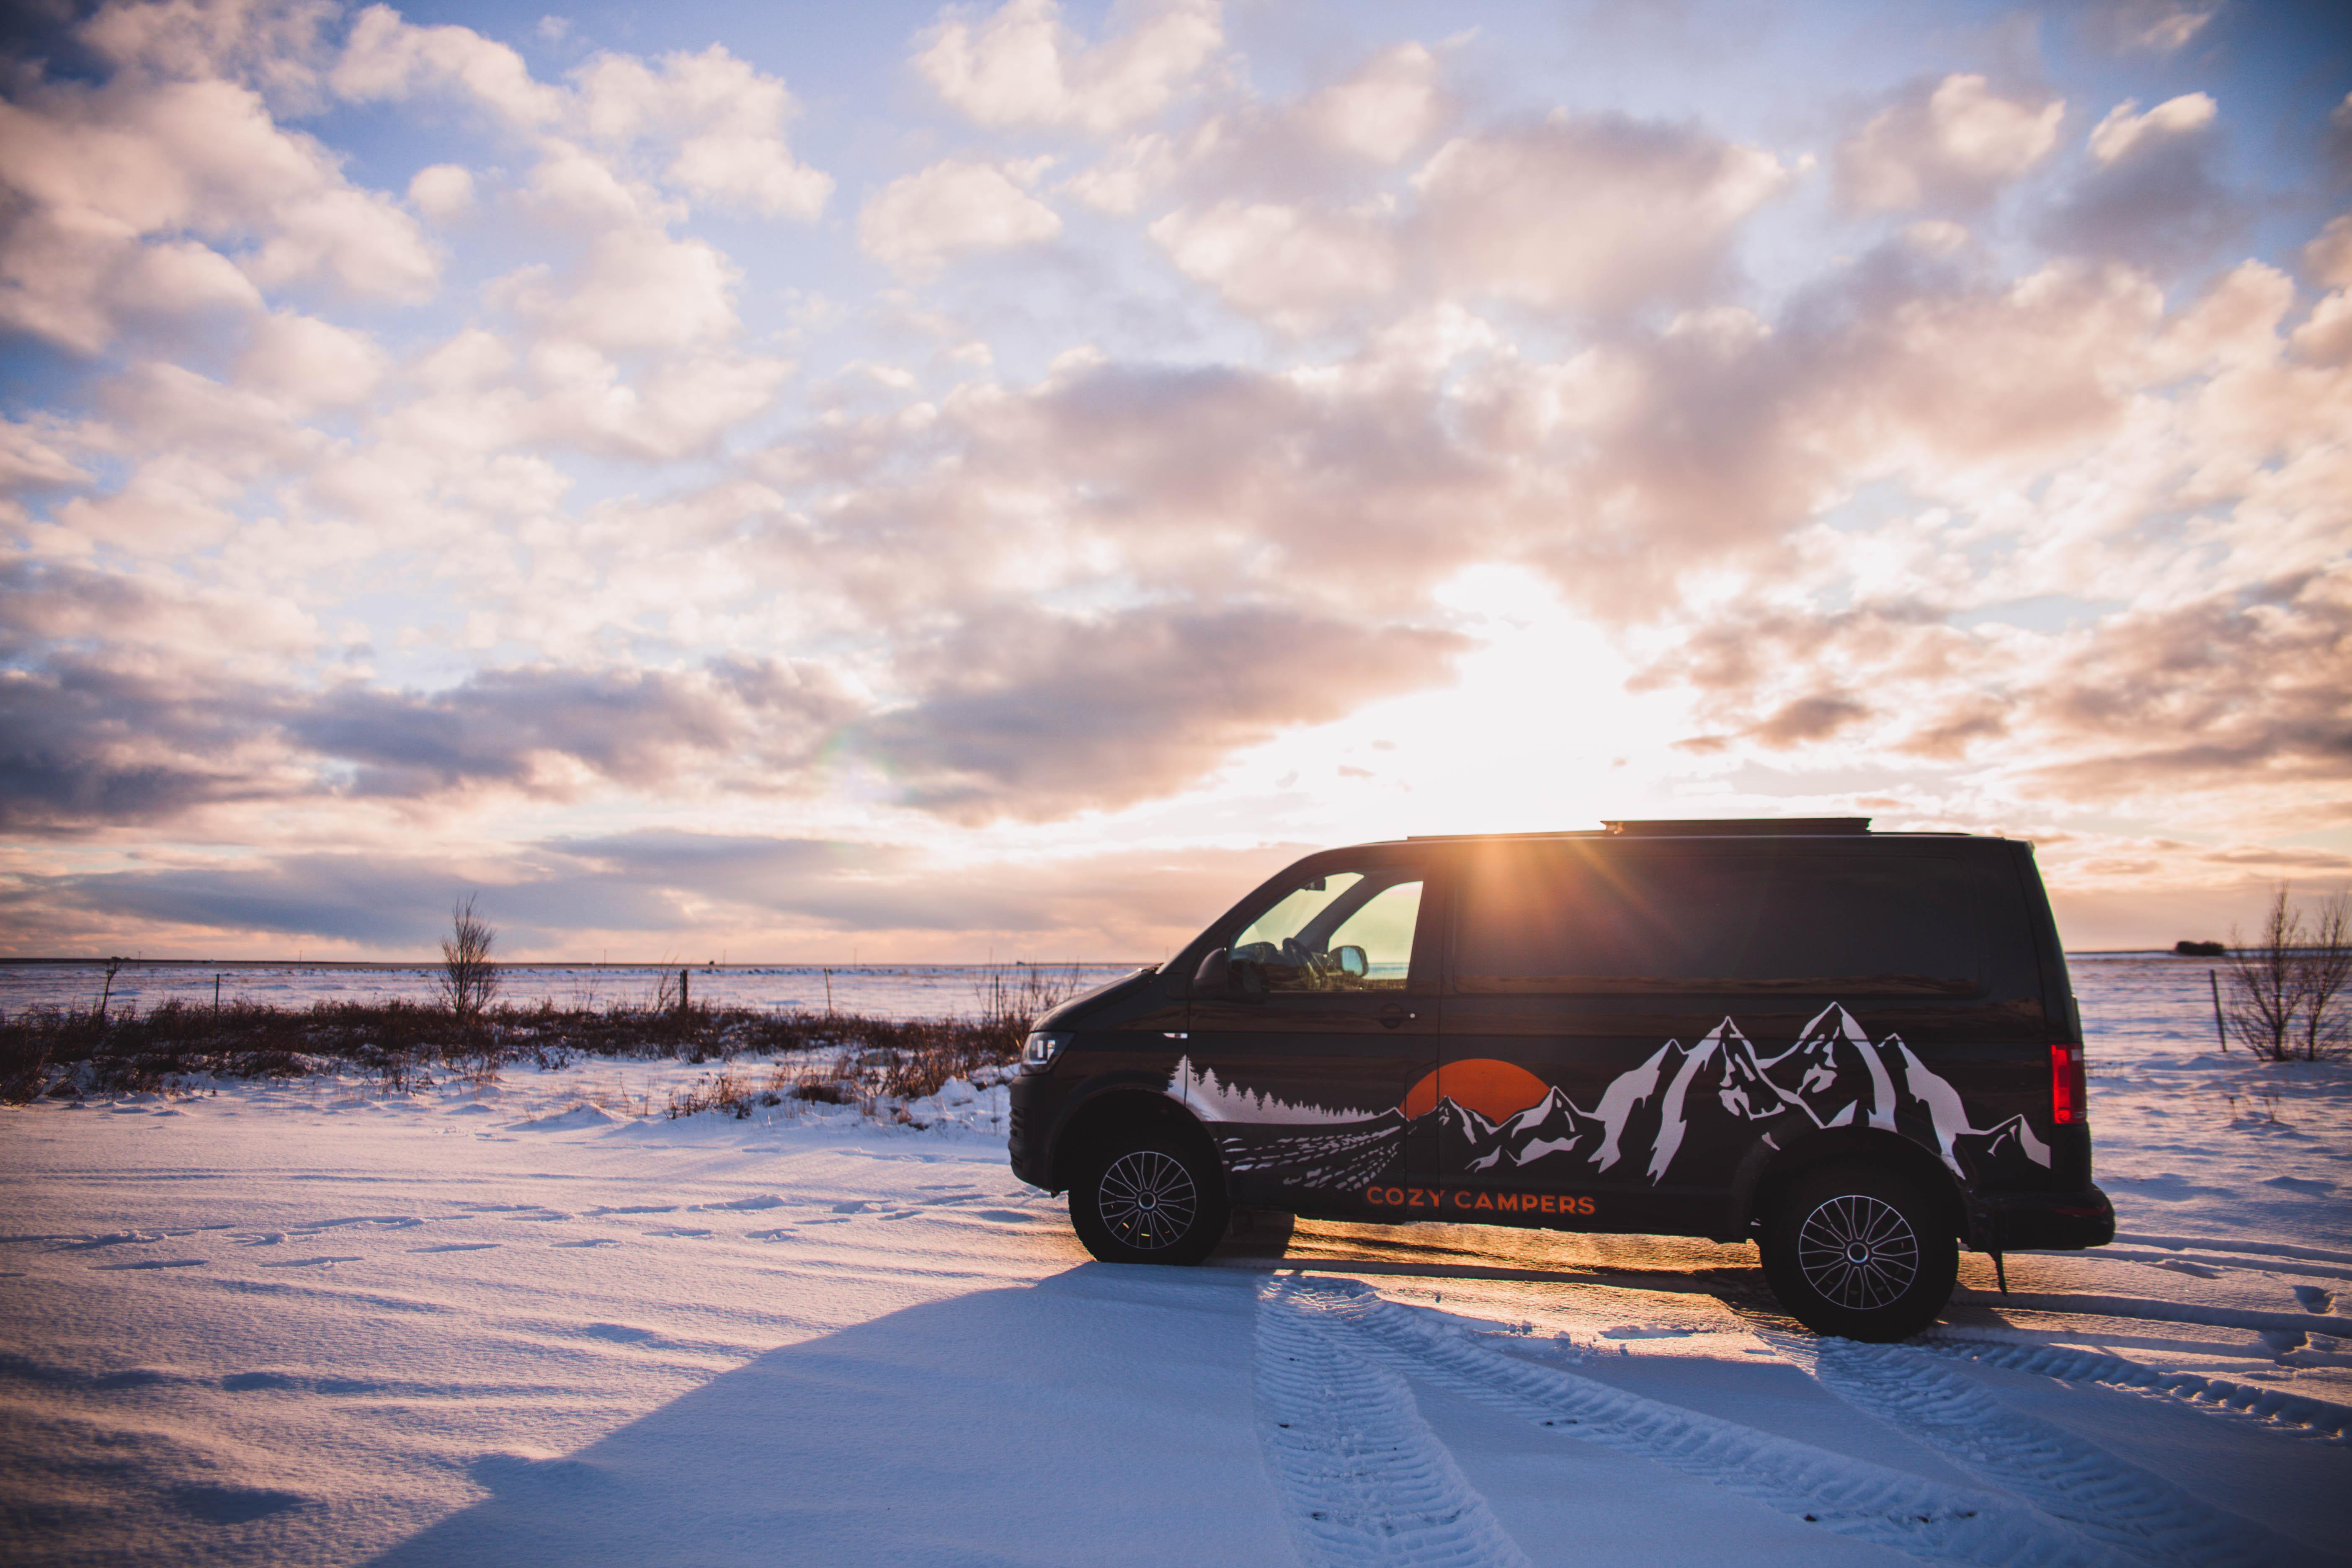 Camper in Iceland in winter landscape